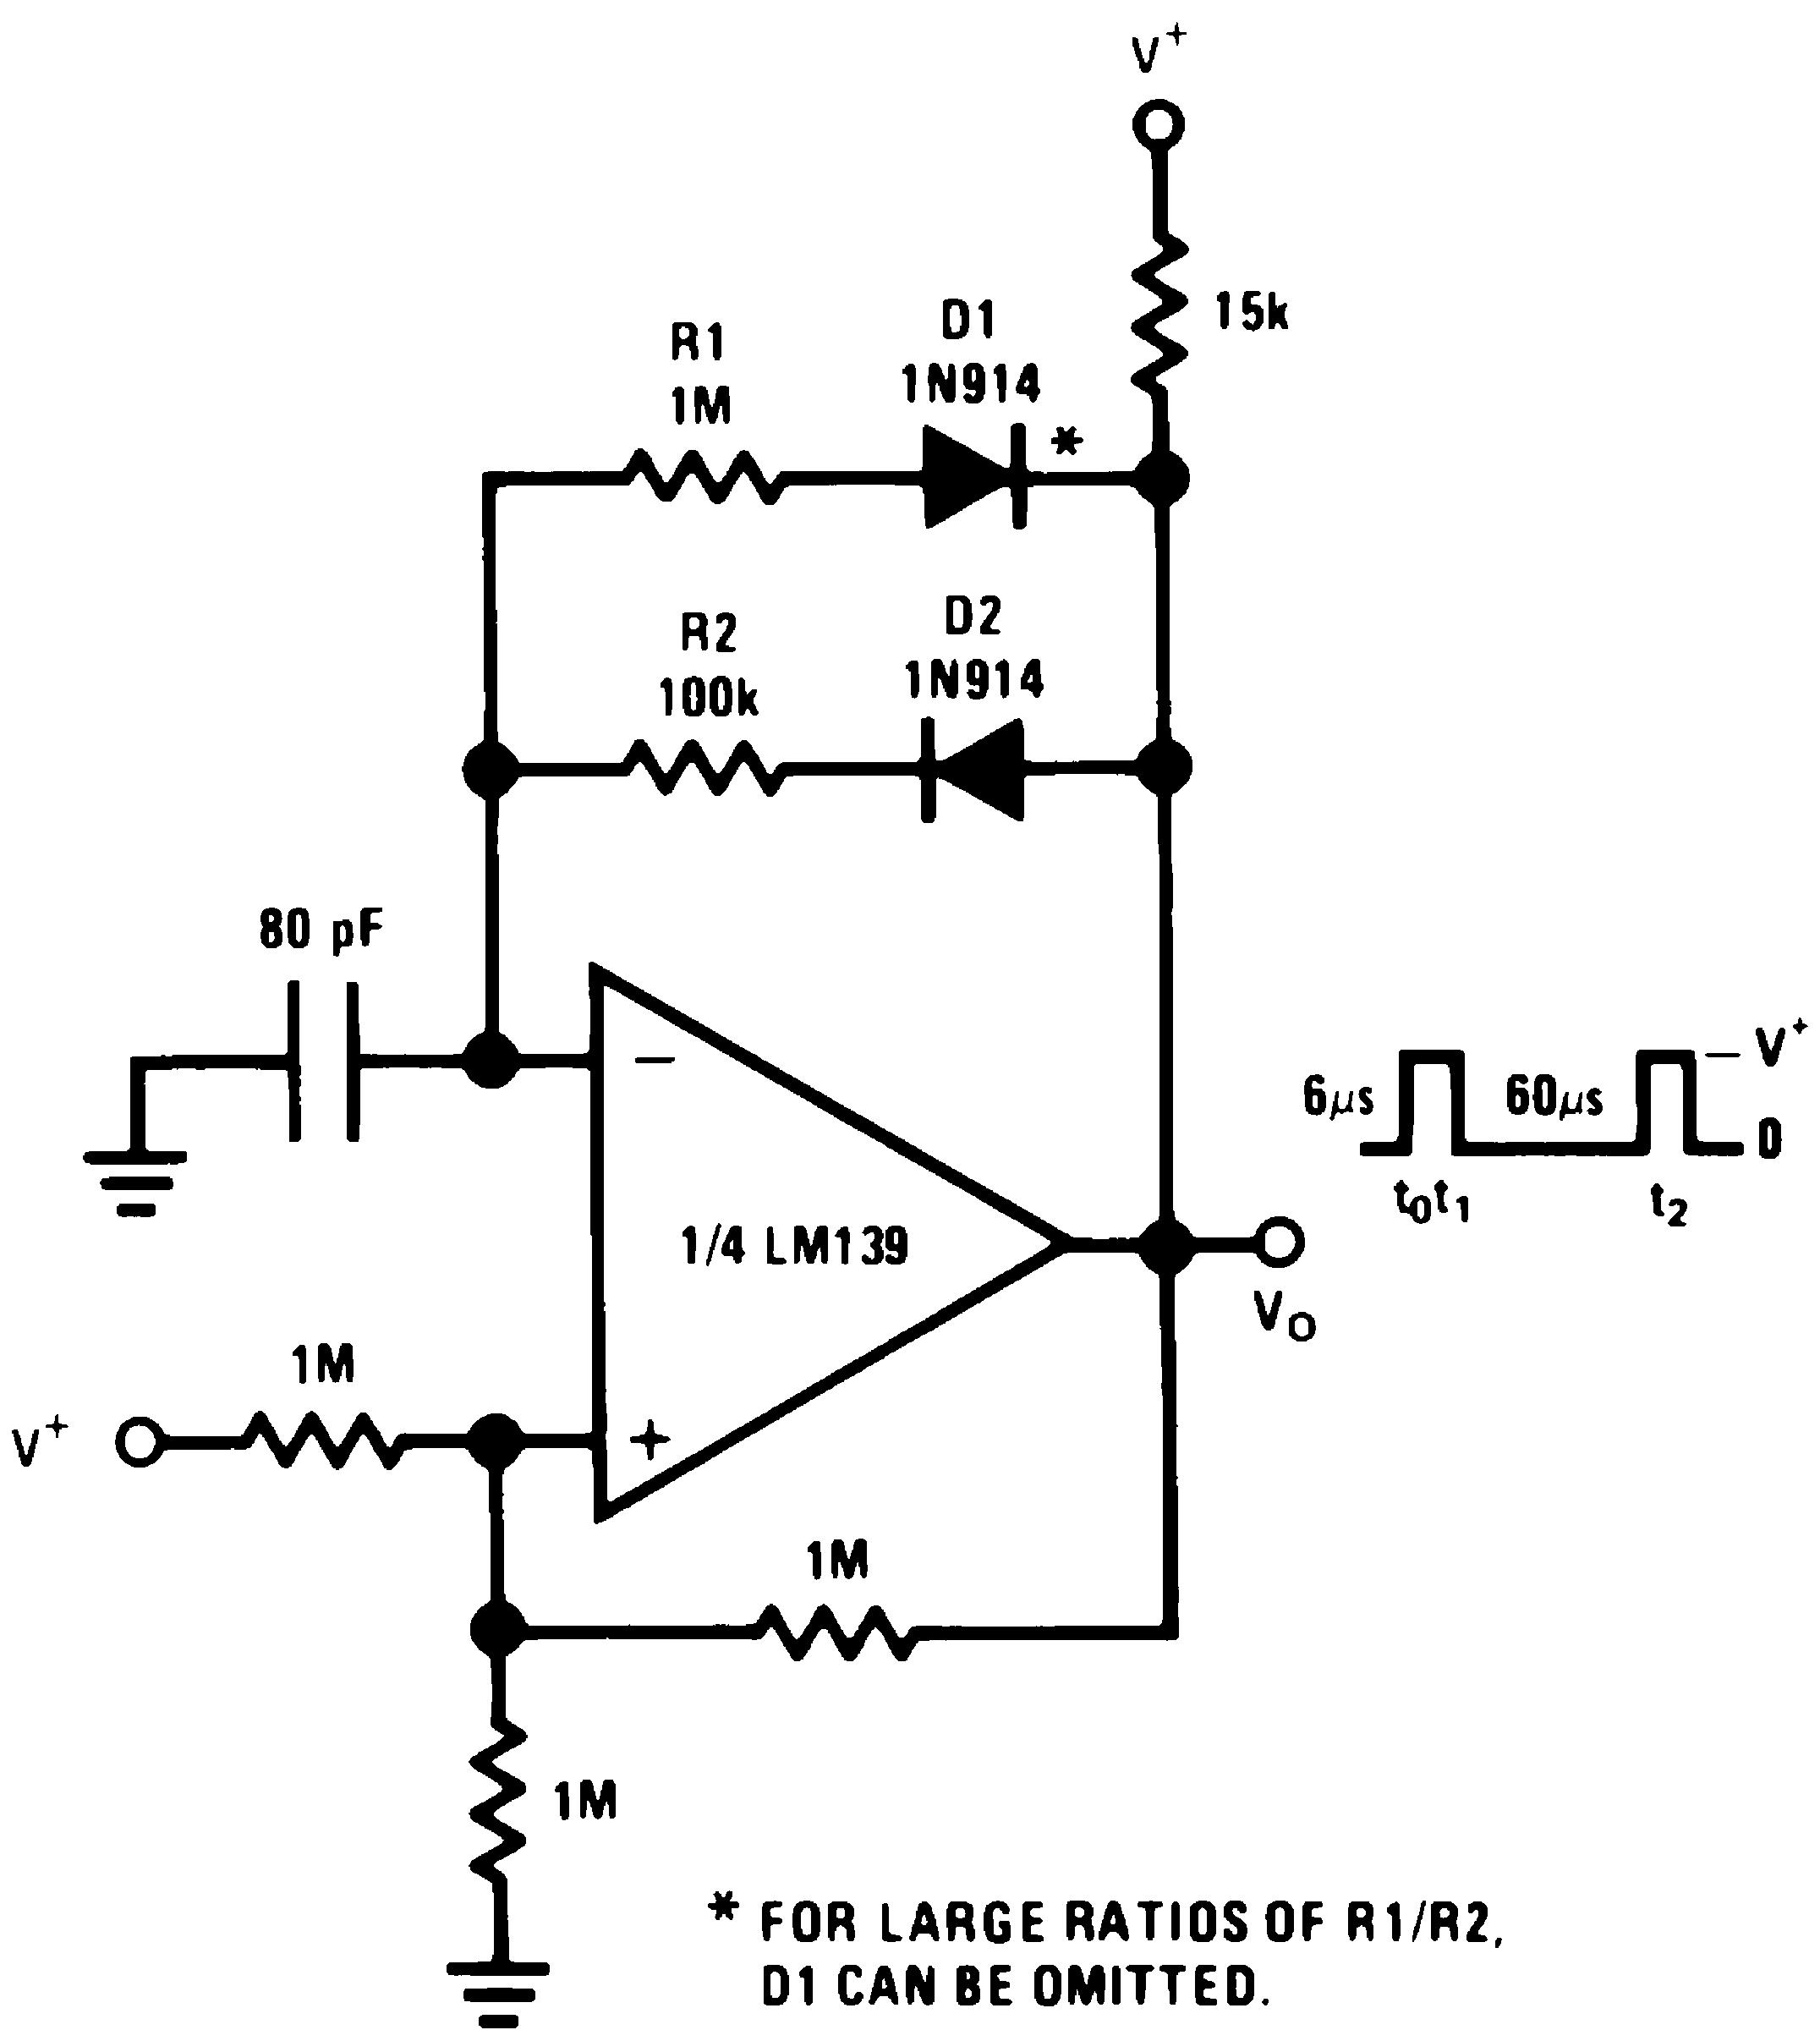 Lm239 N Pulse Generator Astable Multivibrator Circuit Diagram Tradeofic V 15 Vdc